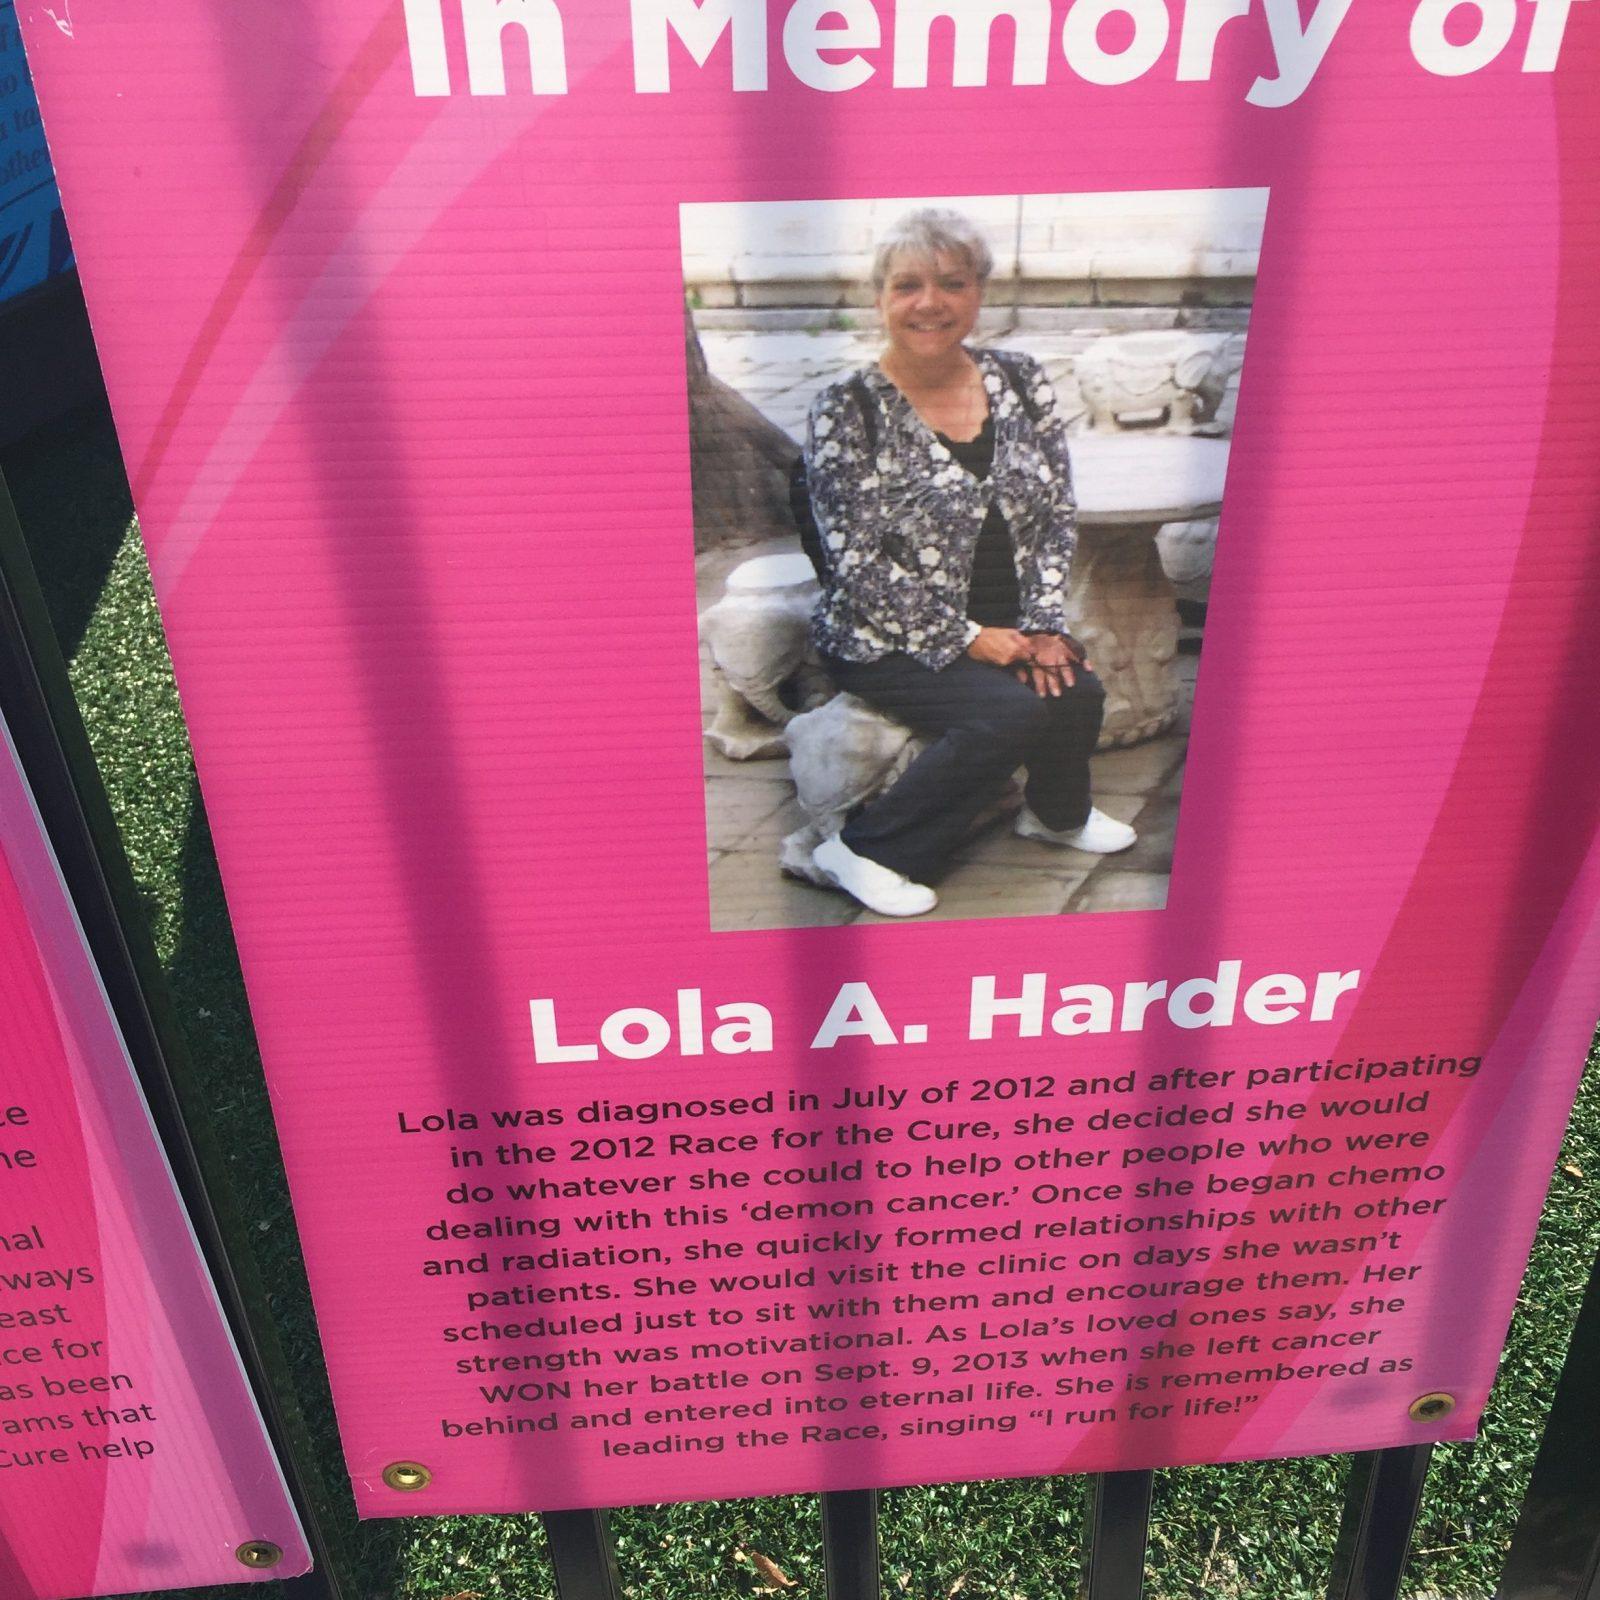 Lola A. Harder